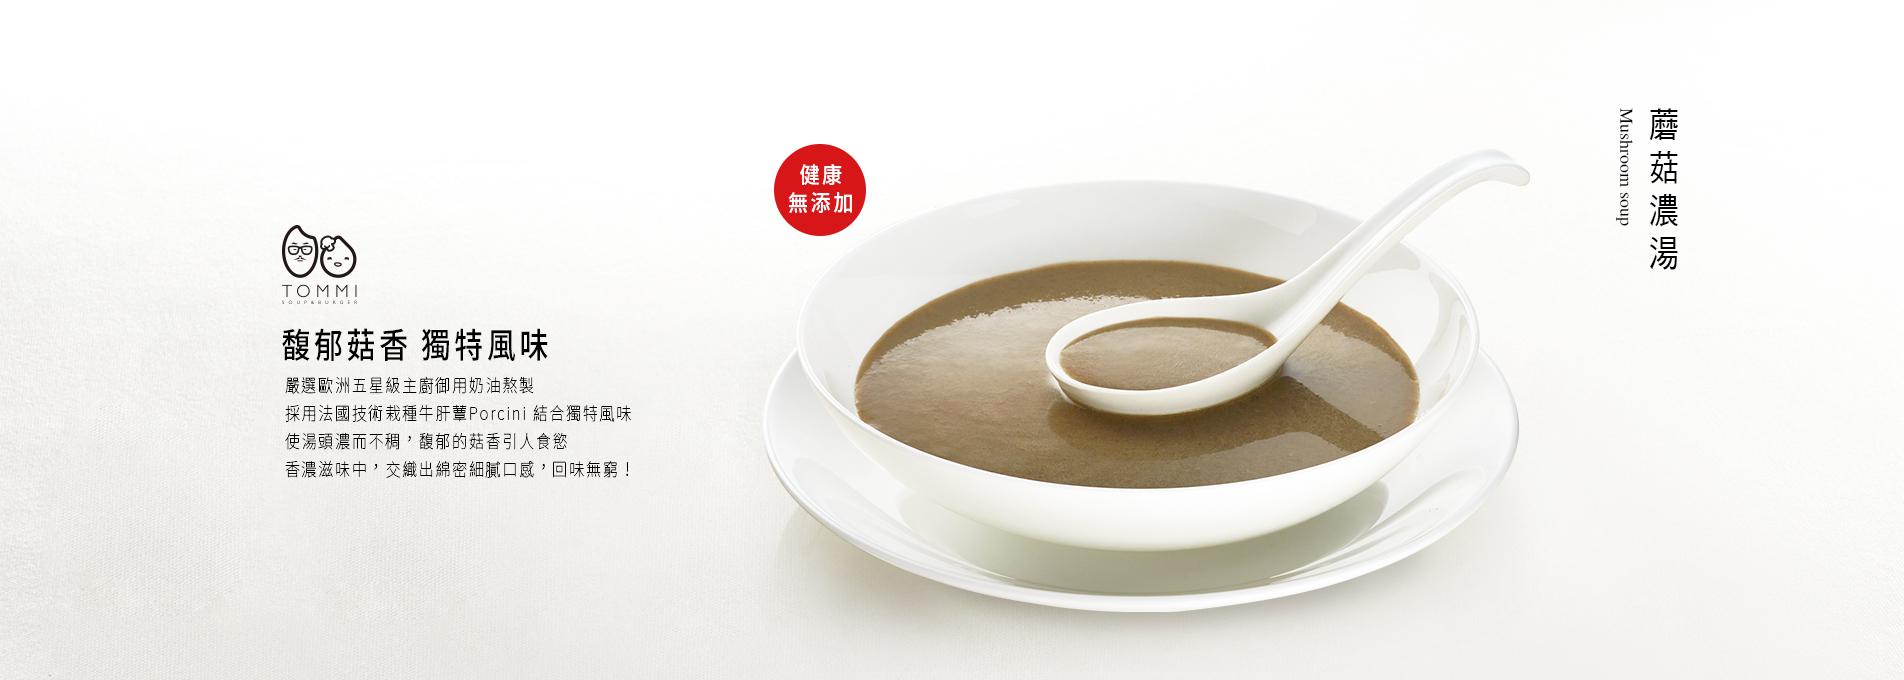 TOMMI湯米 蘑菇濃湯(10入)